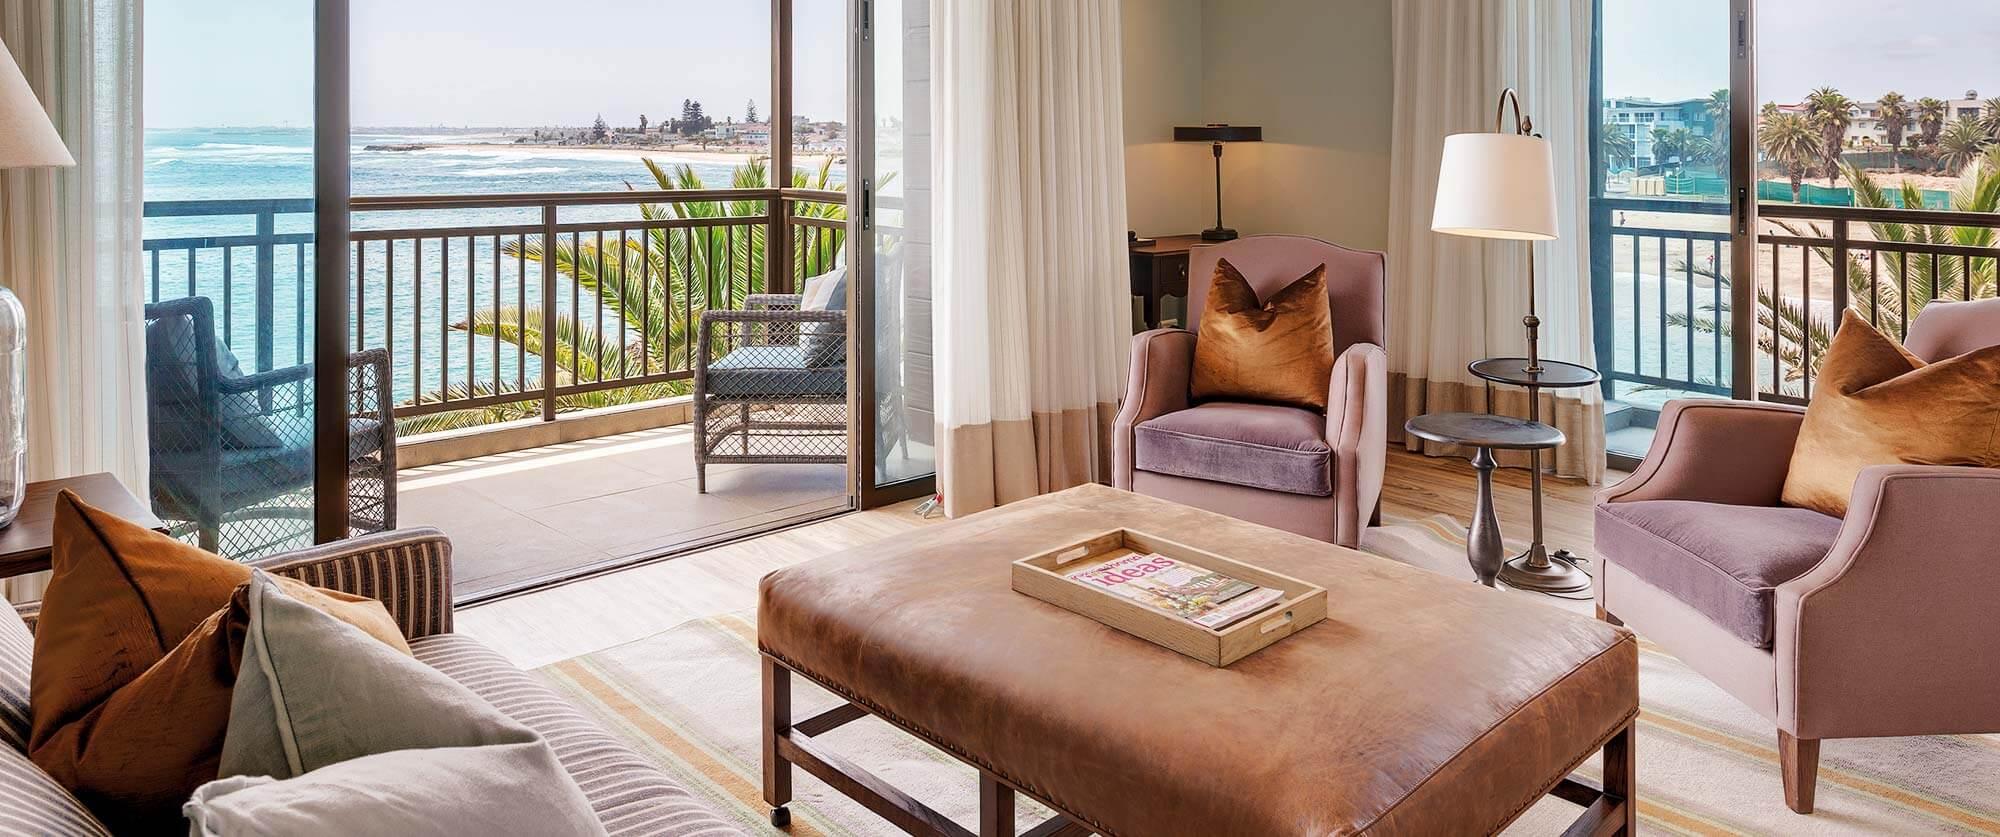 Rooms at Strand Hotel Swakopmund, Namibia